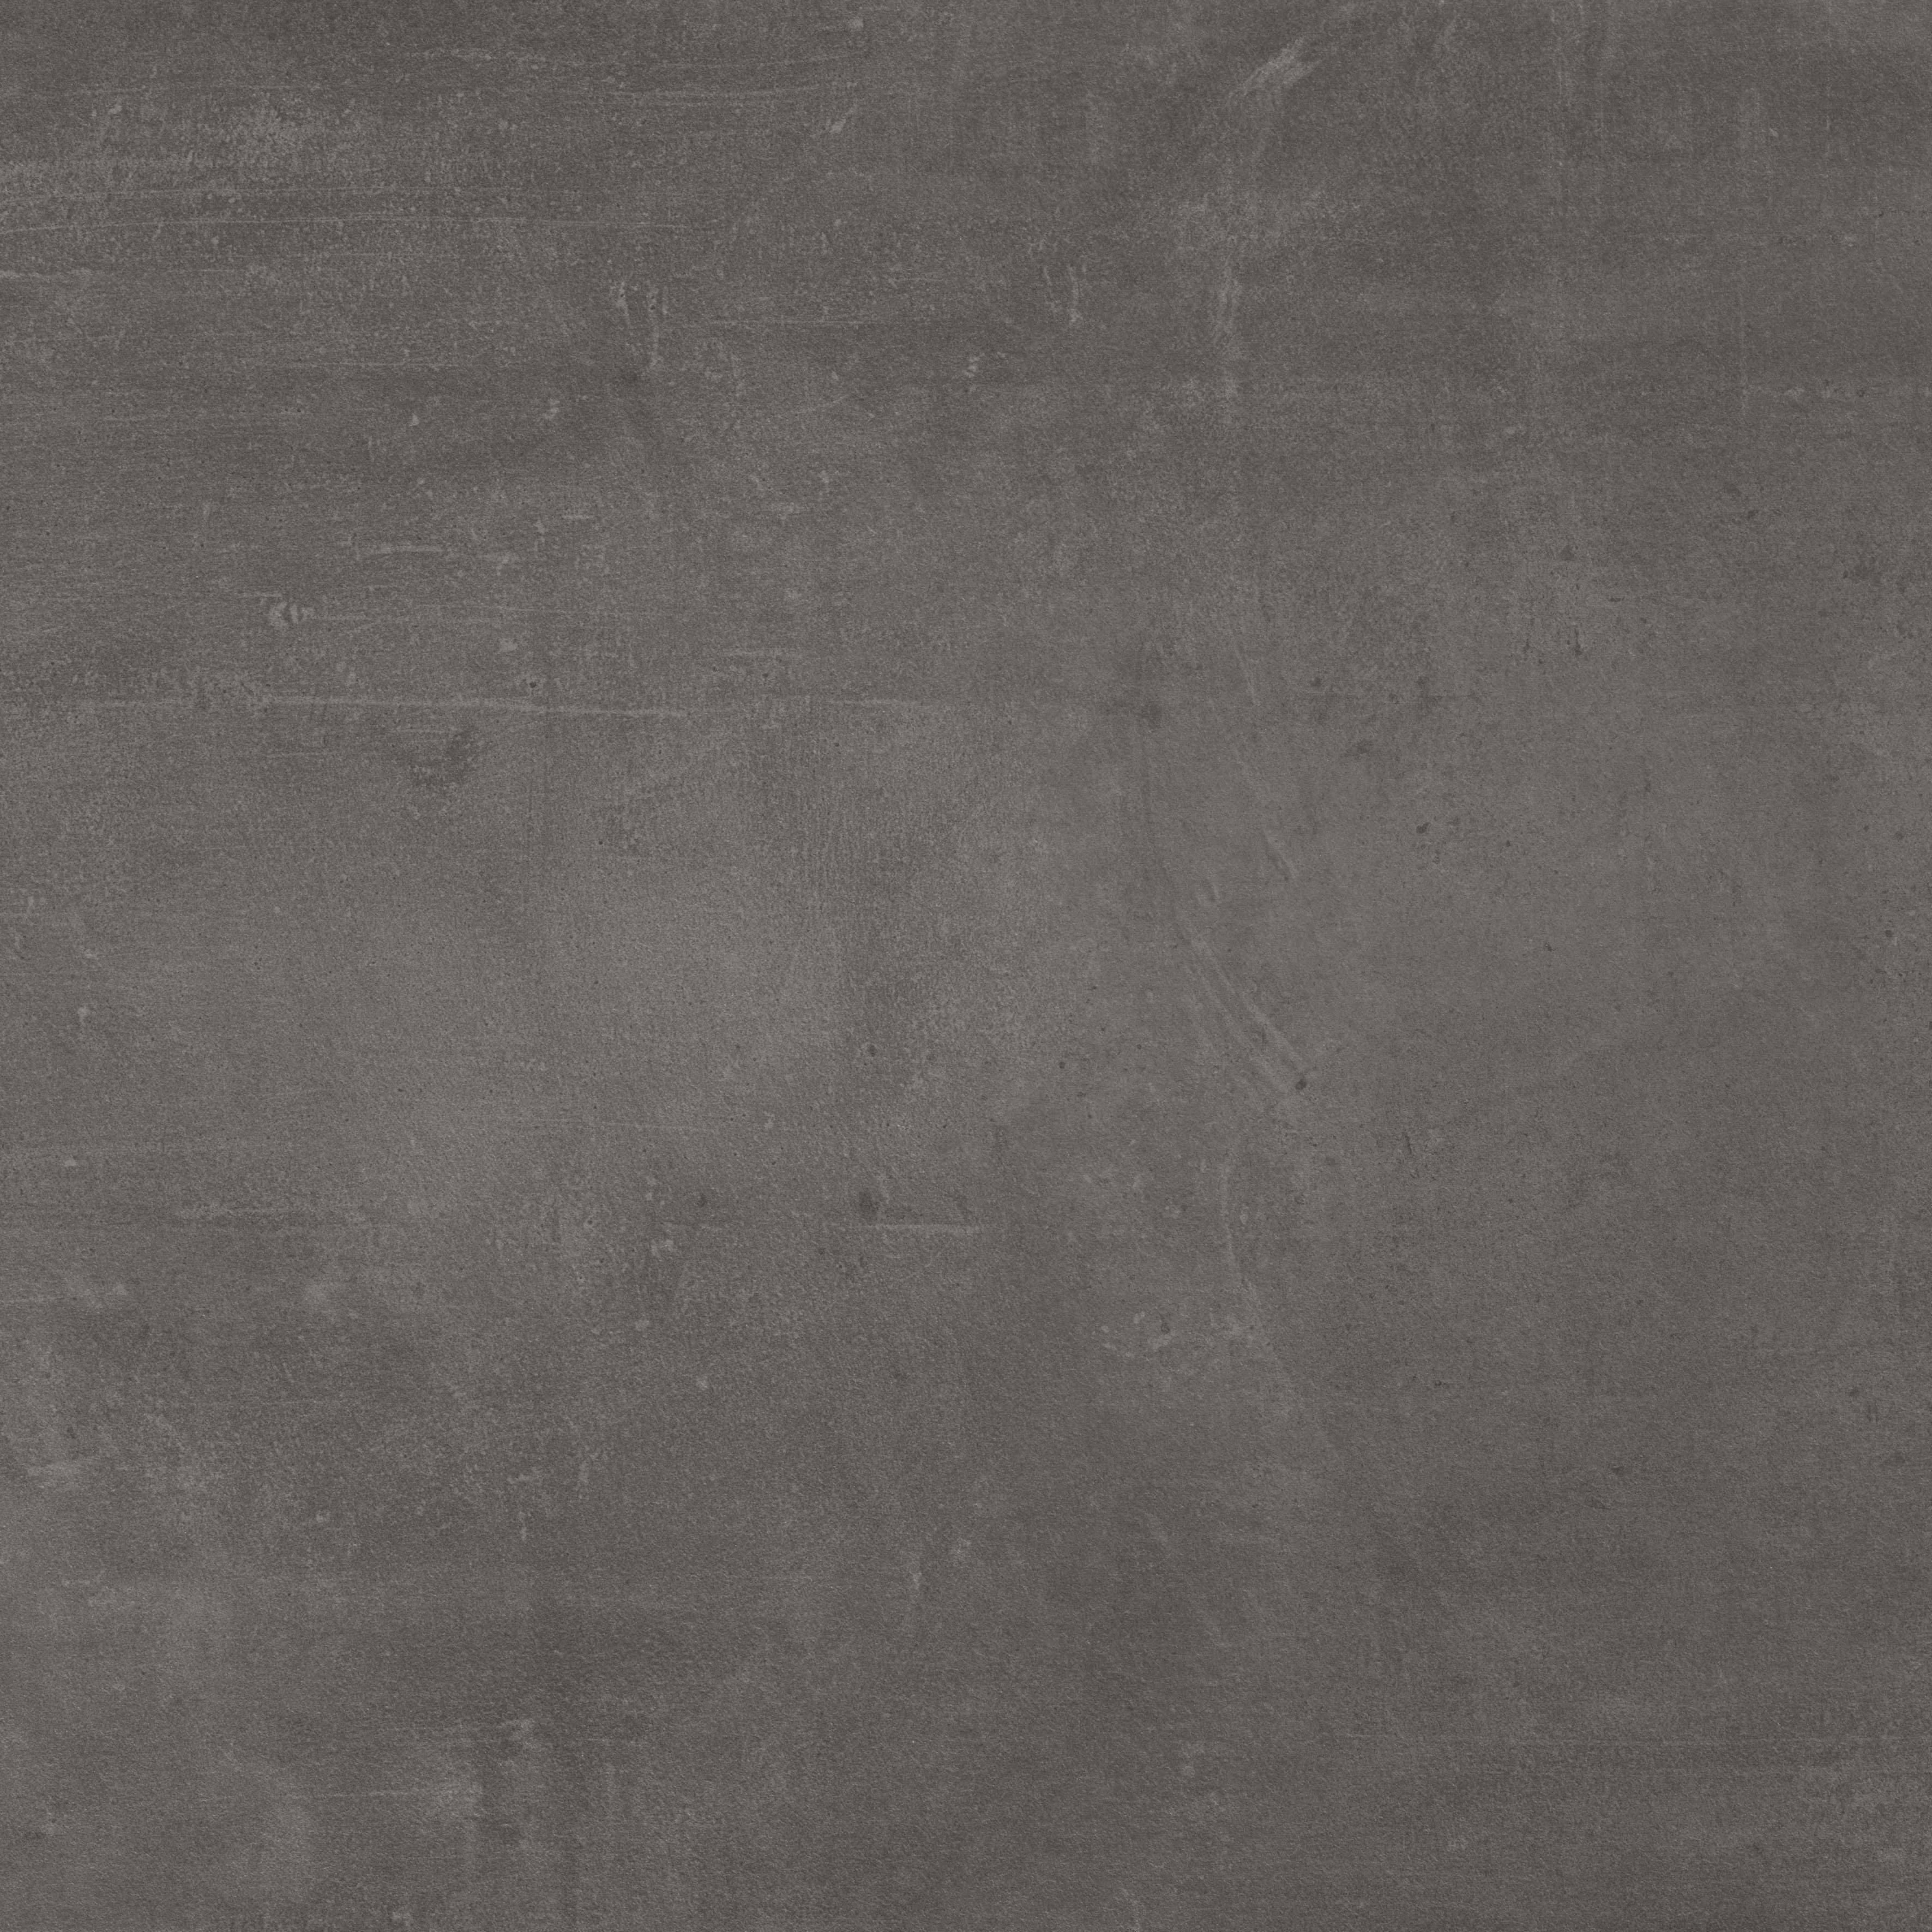 anthrazit Betonfliese 60x60, anthracite concrete effect tile 60x60